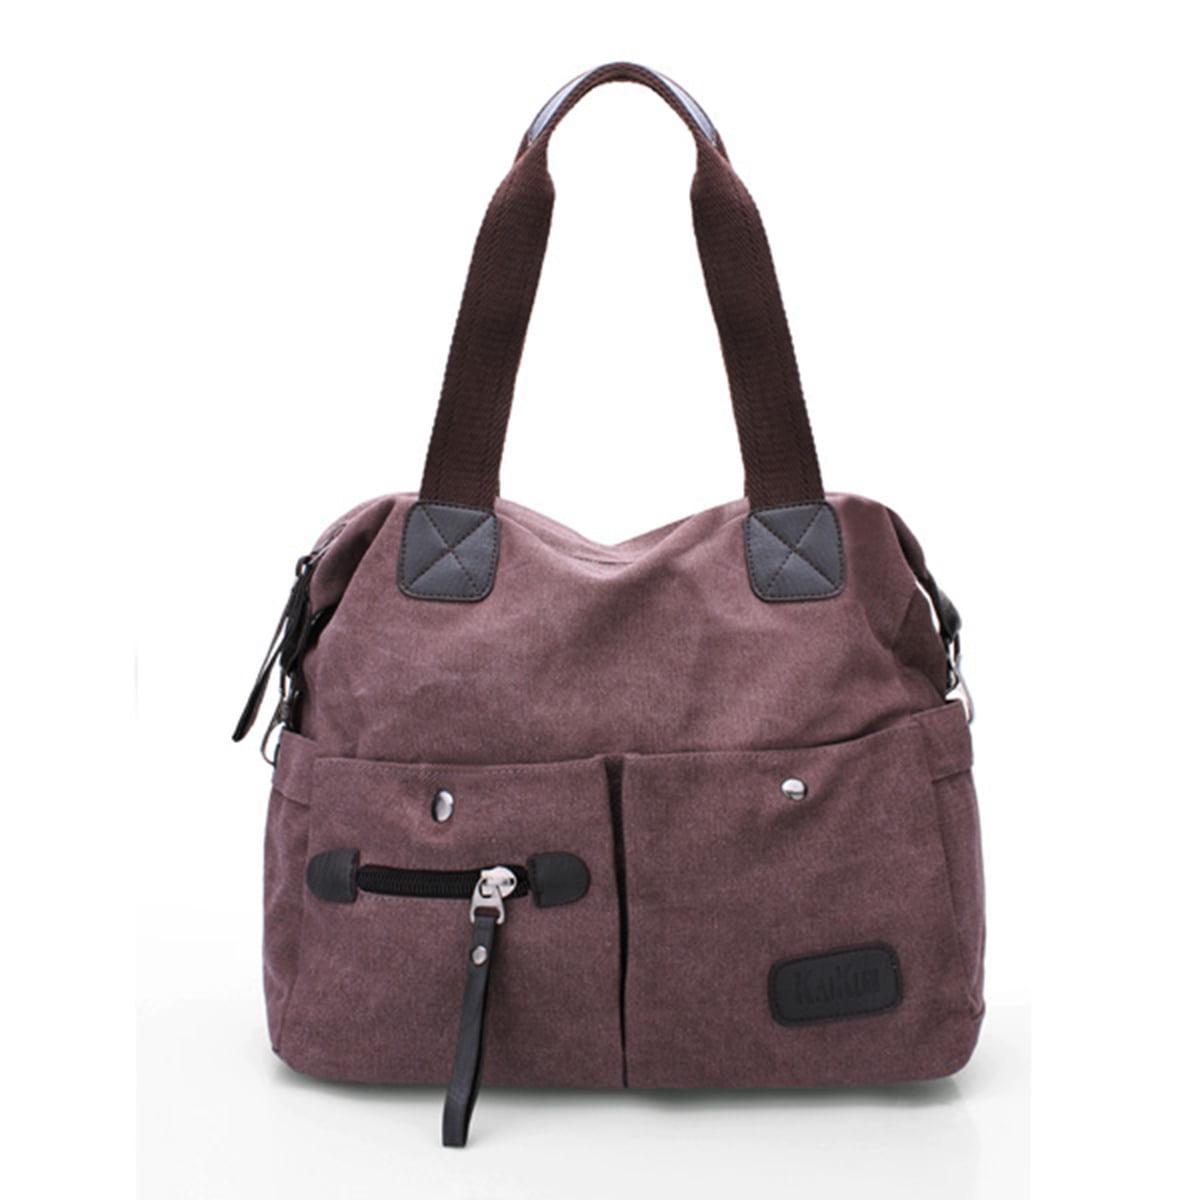 Fashion Women Canvas Zip Large Bag Tote Shoulder Messenger Handbag Cross  Body - Walmart.com 40d69a78f3bf5